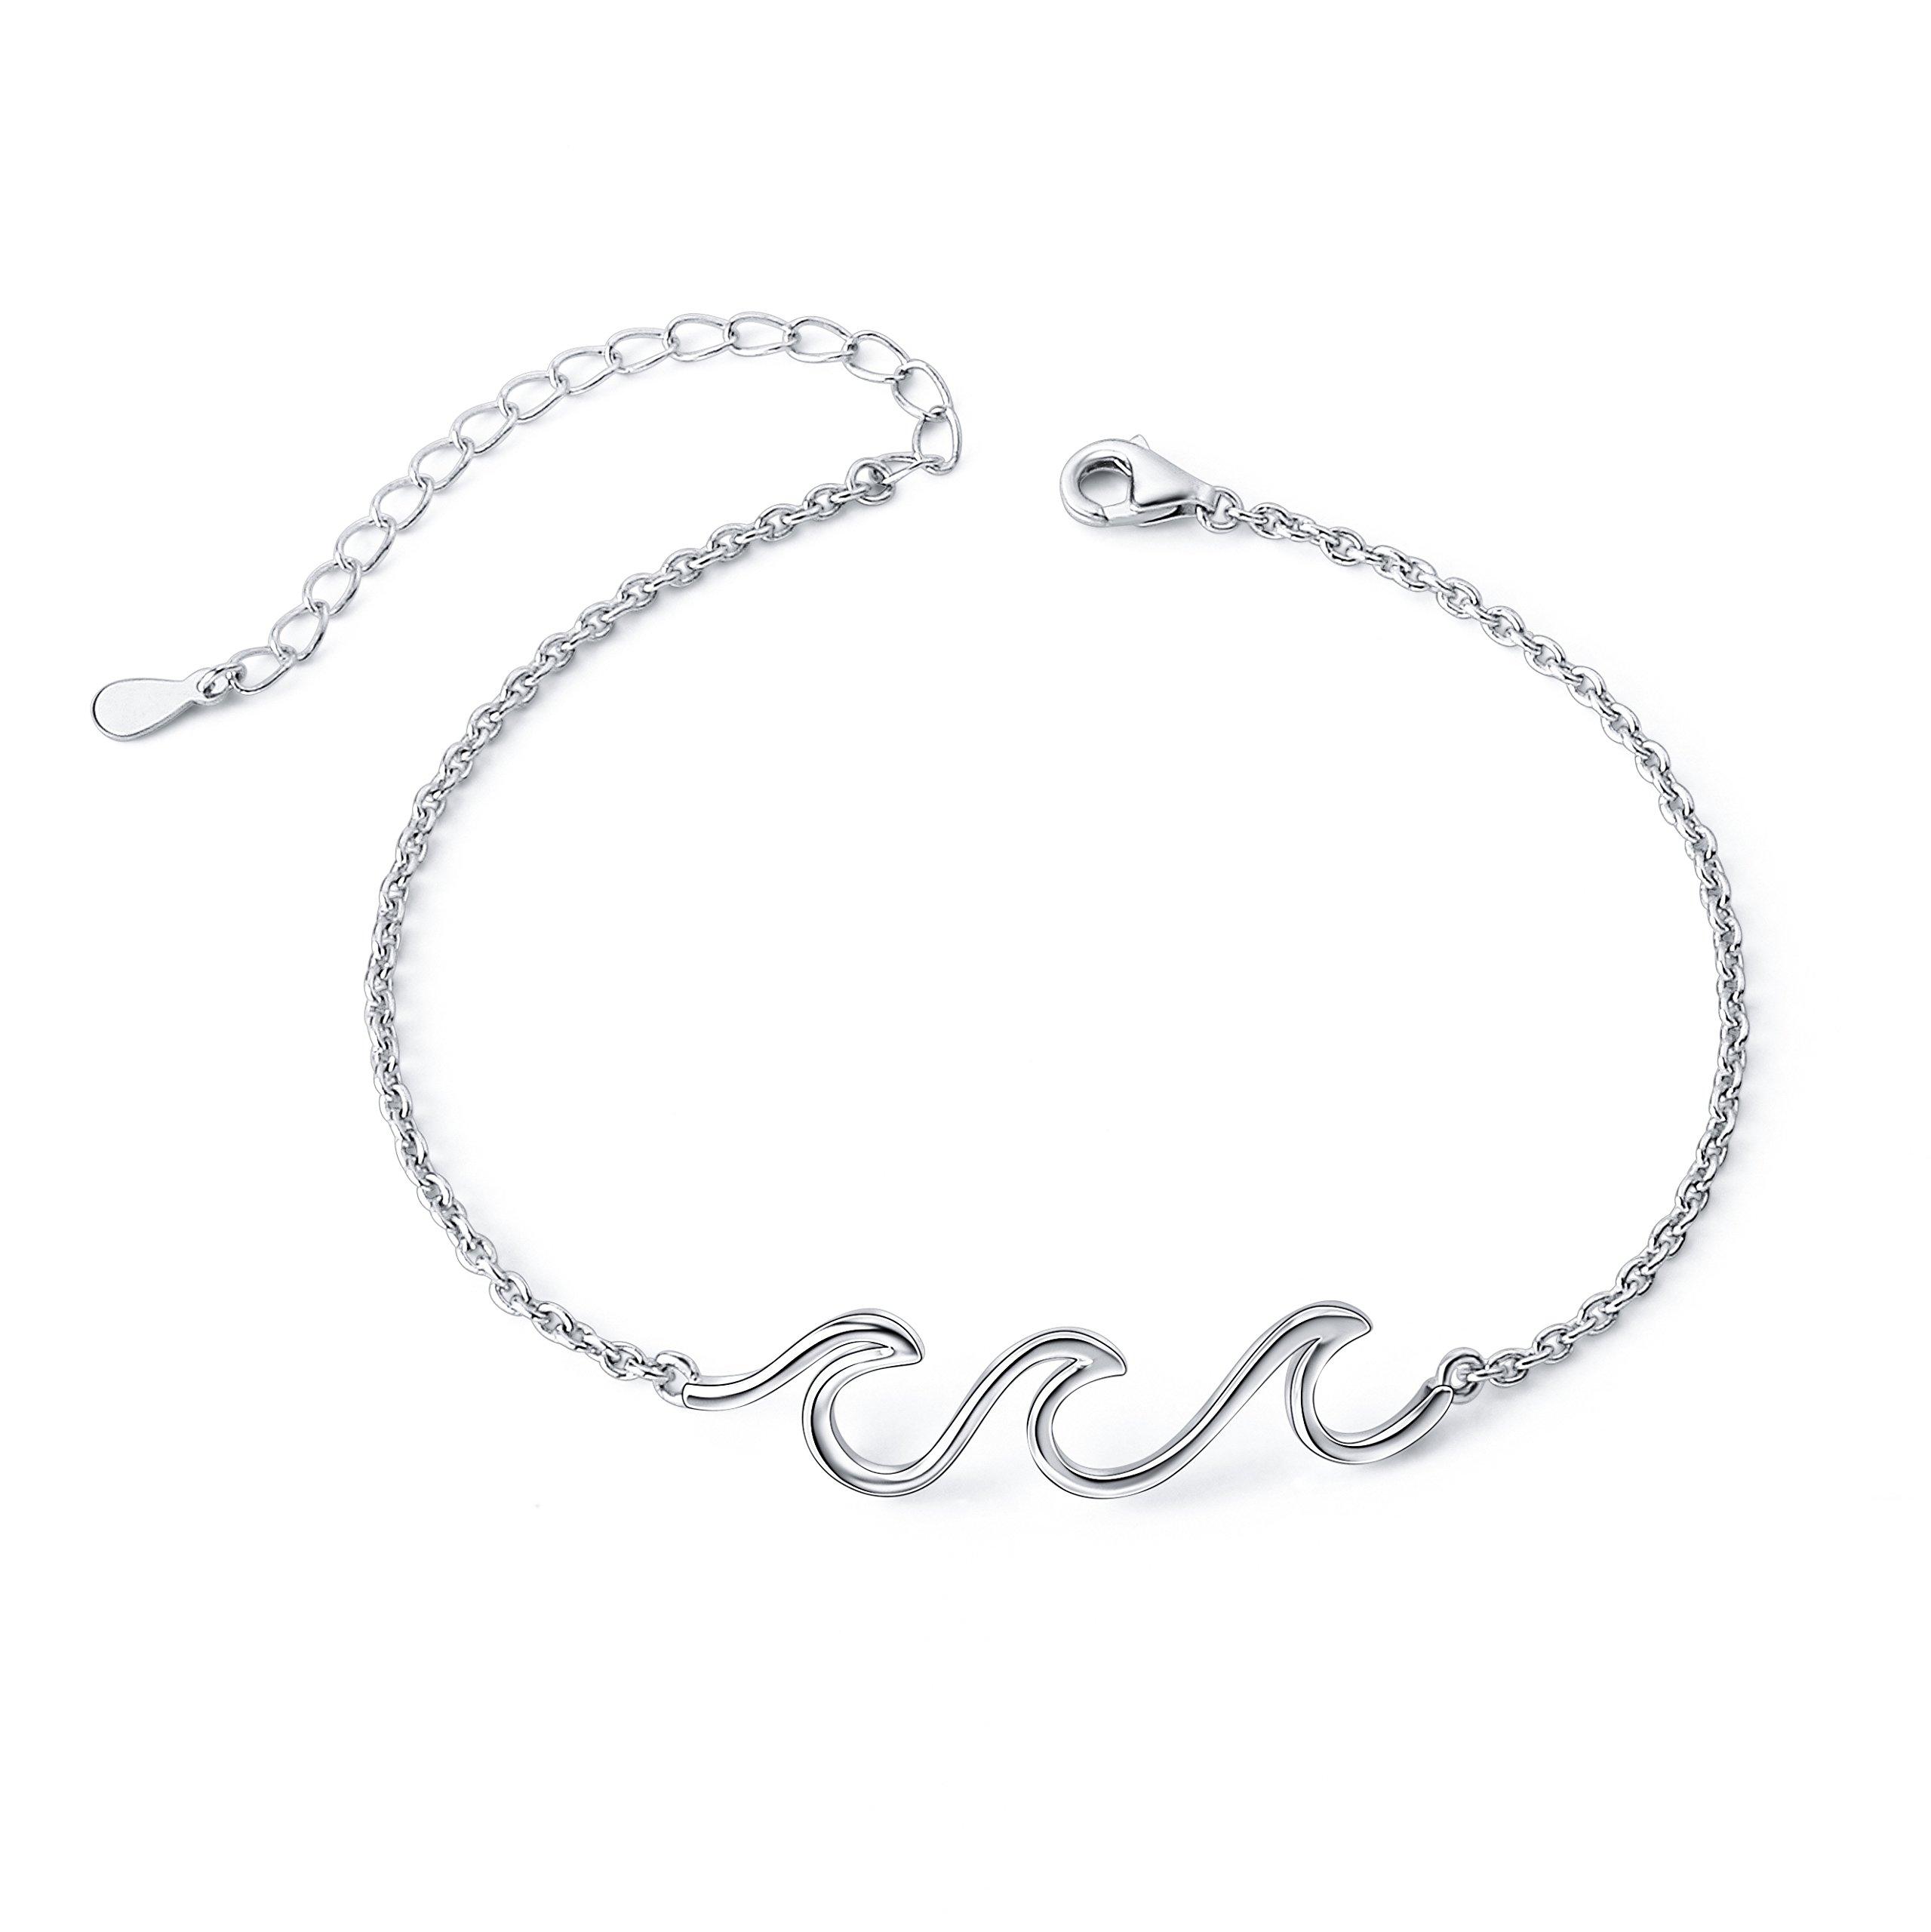 Wave Ocean Beach Sea Anklet for Women S925 Sterling Silver Adjustable Ankle Foot Bracelet 10 Inch